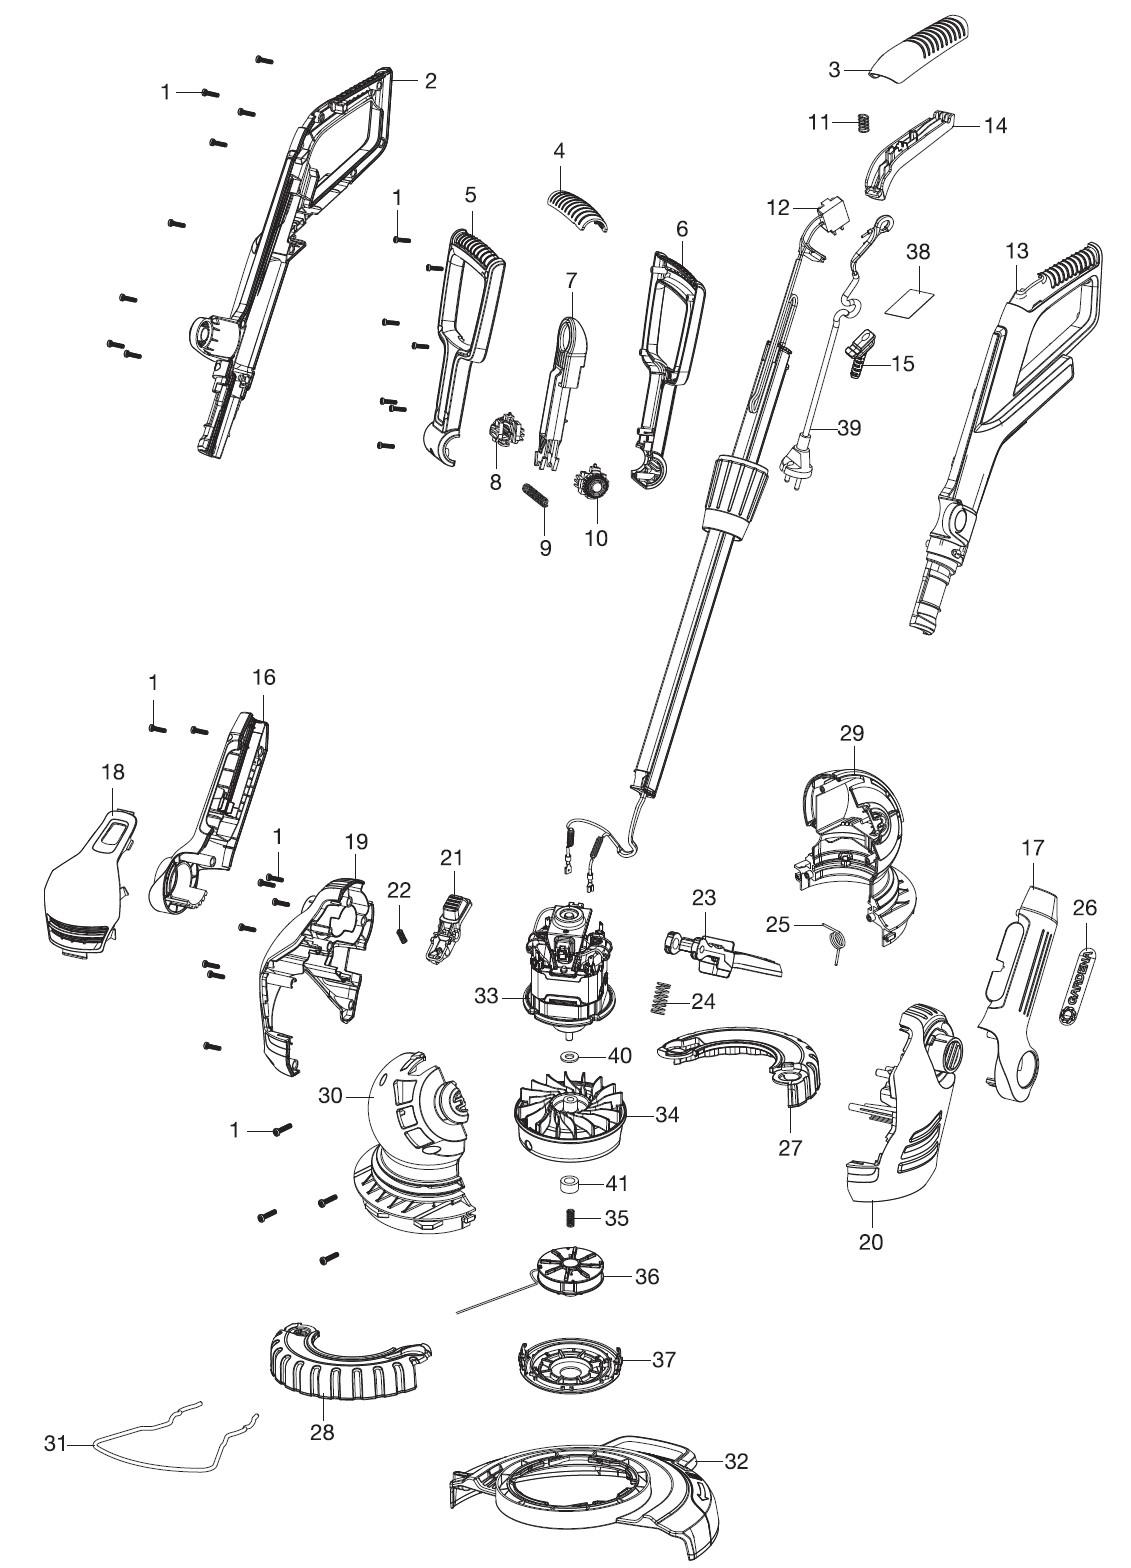 Ersatzteile Gardena Trimmer Comfortcut 45025 9808 Ersatzteil Fee